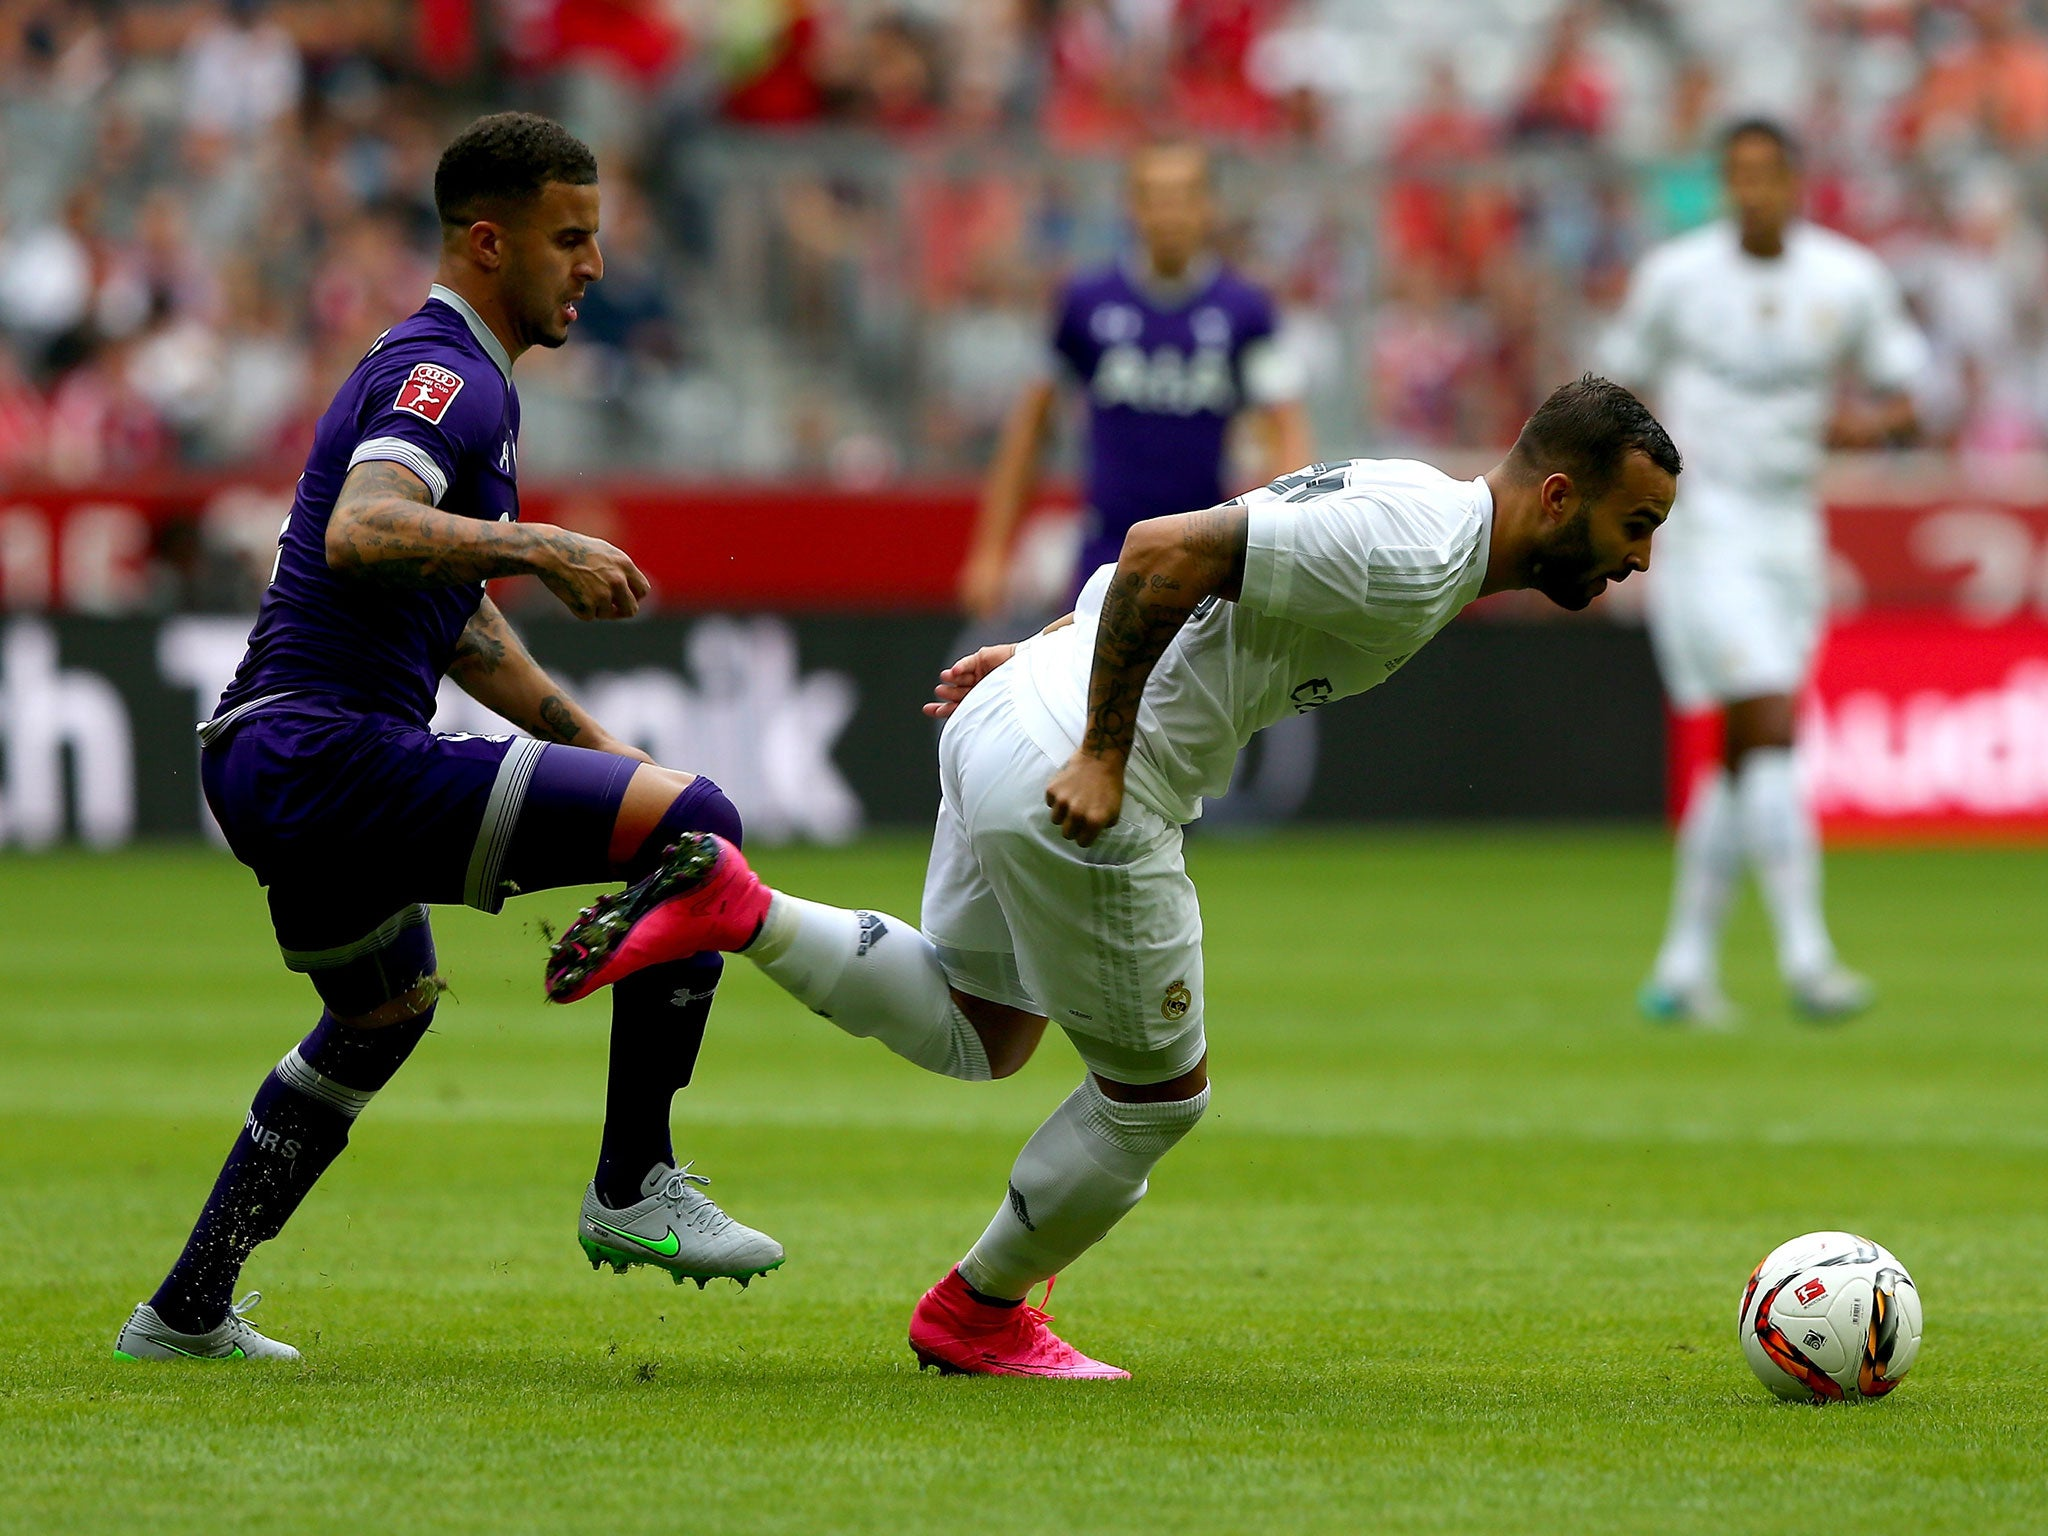 Tottenham third shirt 2015 16  Spurs unveil purple kit in Audi Cup ... c8b04a850